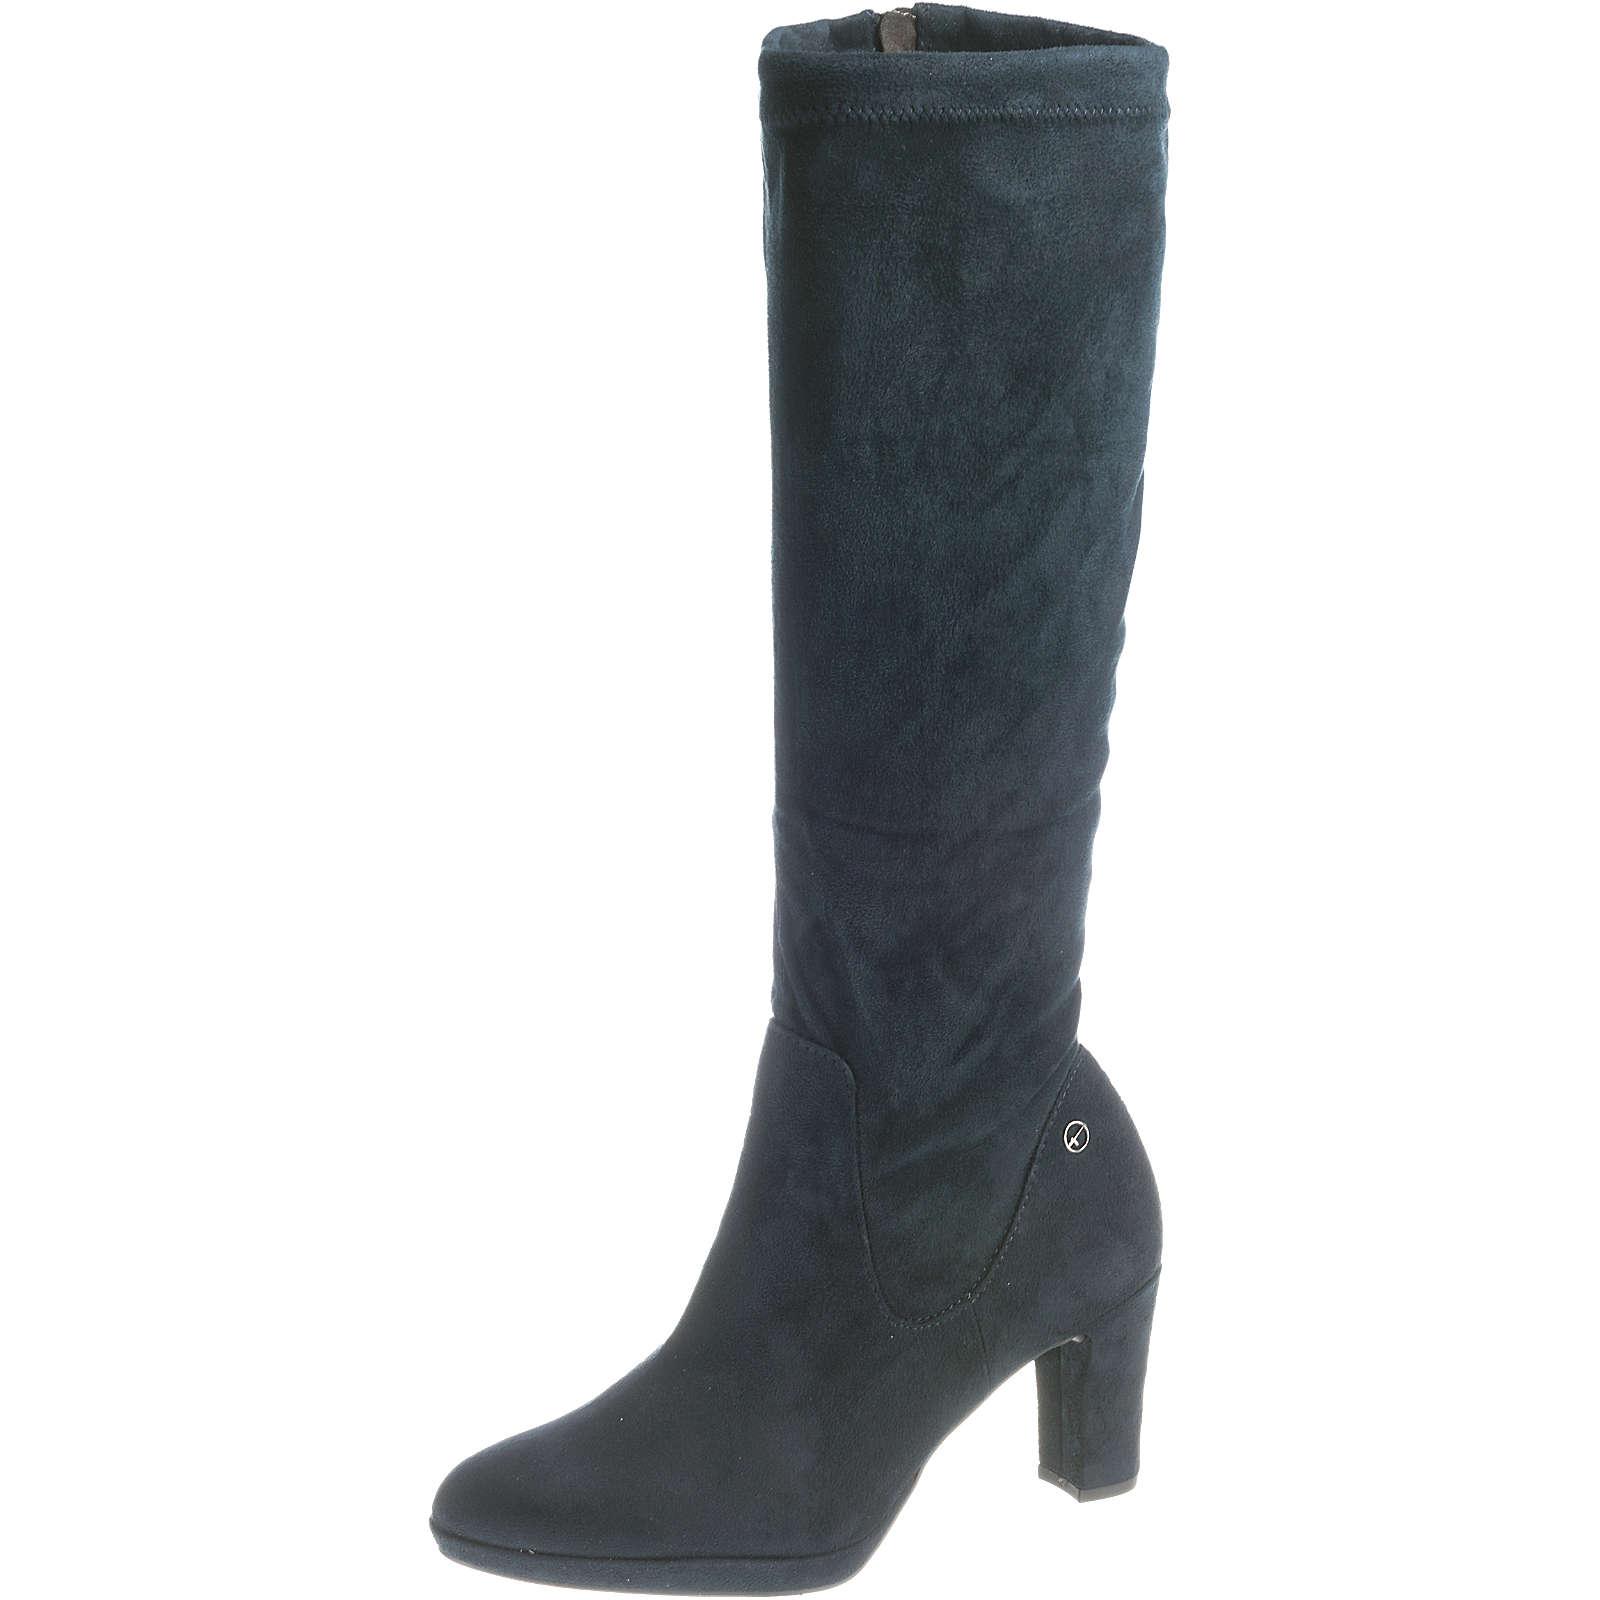 Tamaris Klassische Stiefel dunkelblau Damen Gr. 41